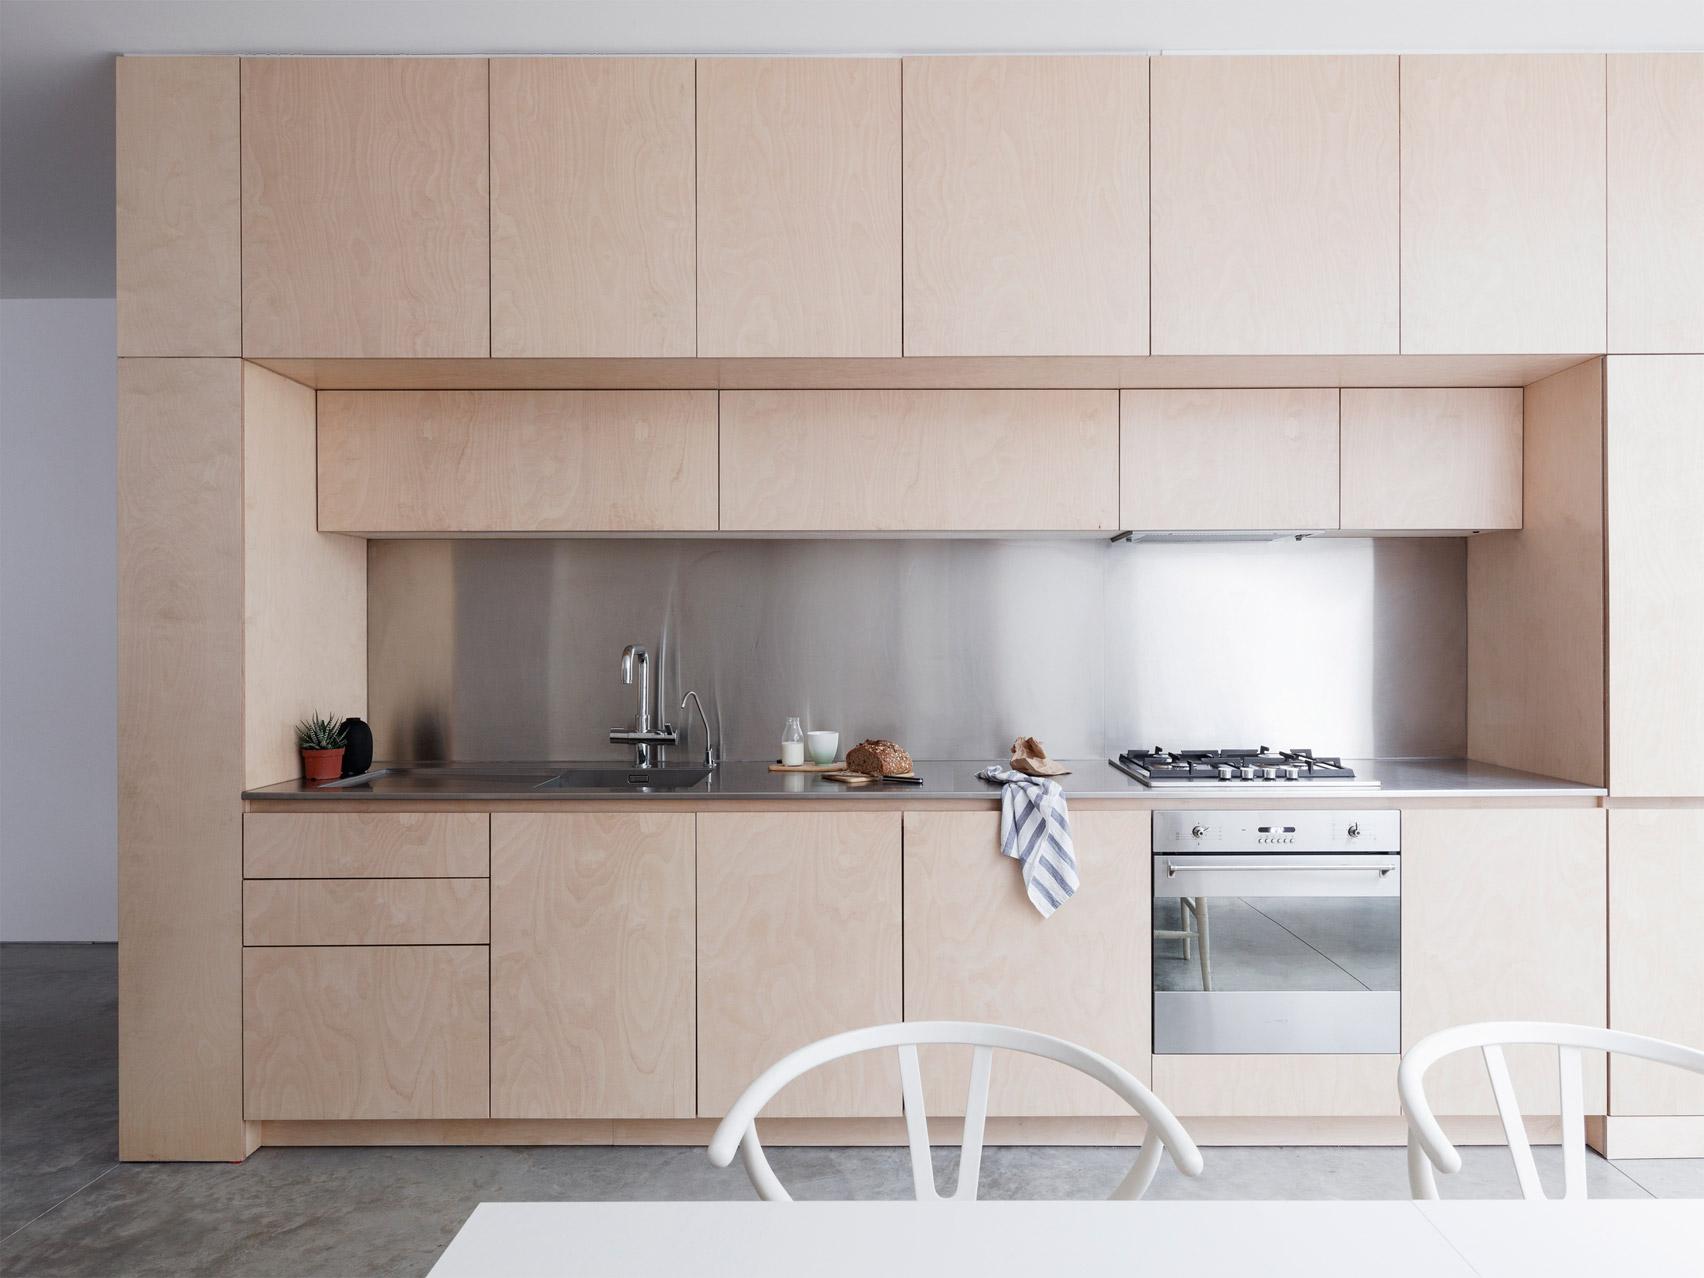 Küche Bauhaus | Yes Box Kuche Bauhaus London Maisonette Gets Bright And Airy